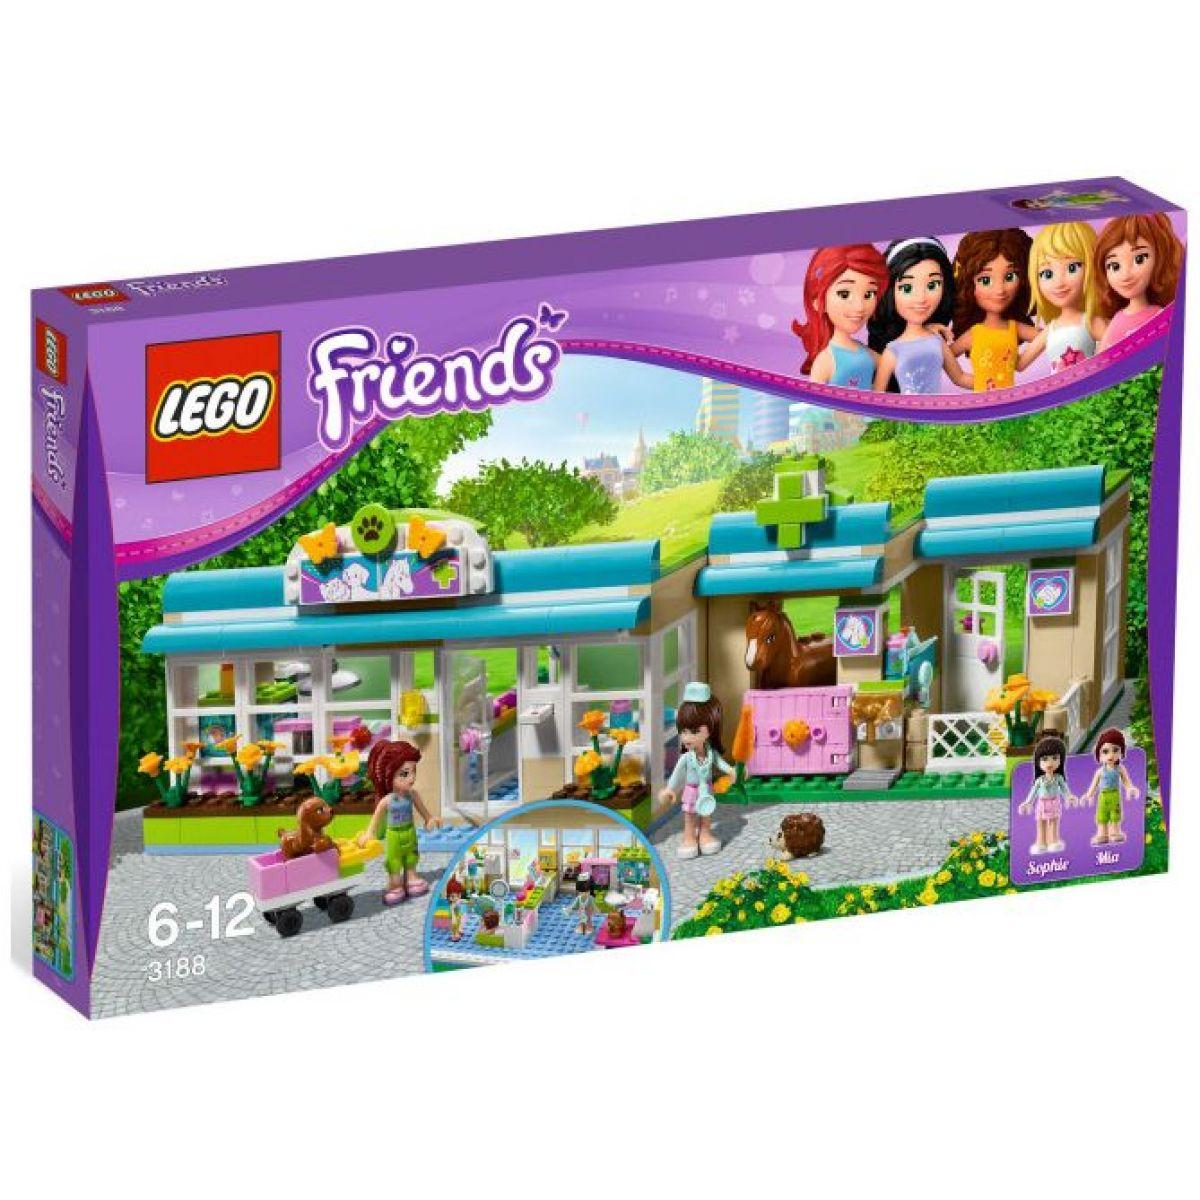 LEGO Friends 3188 Veterinární klinika v Heartlake